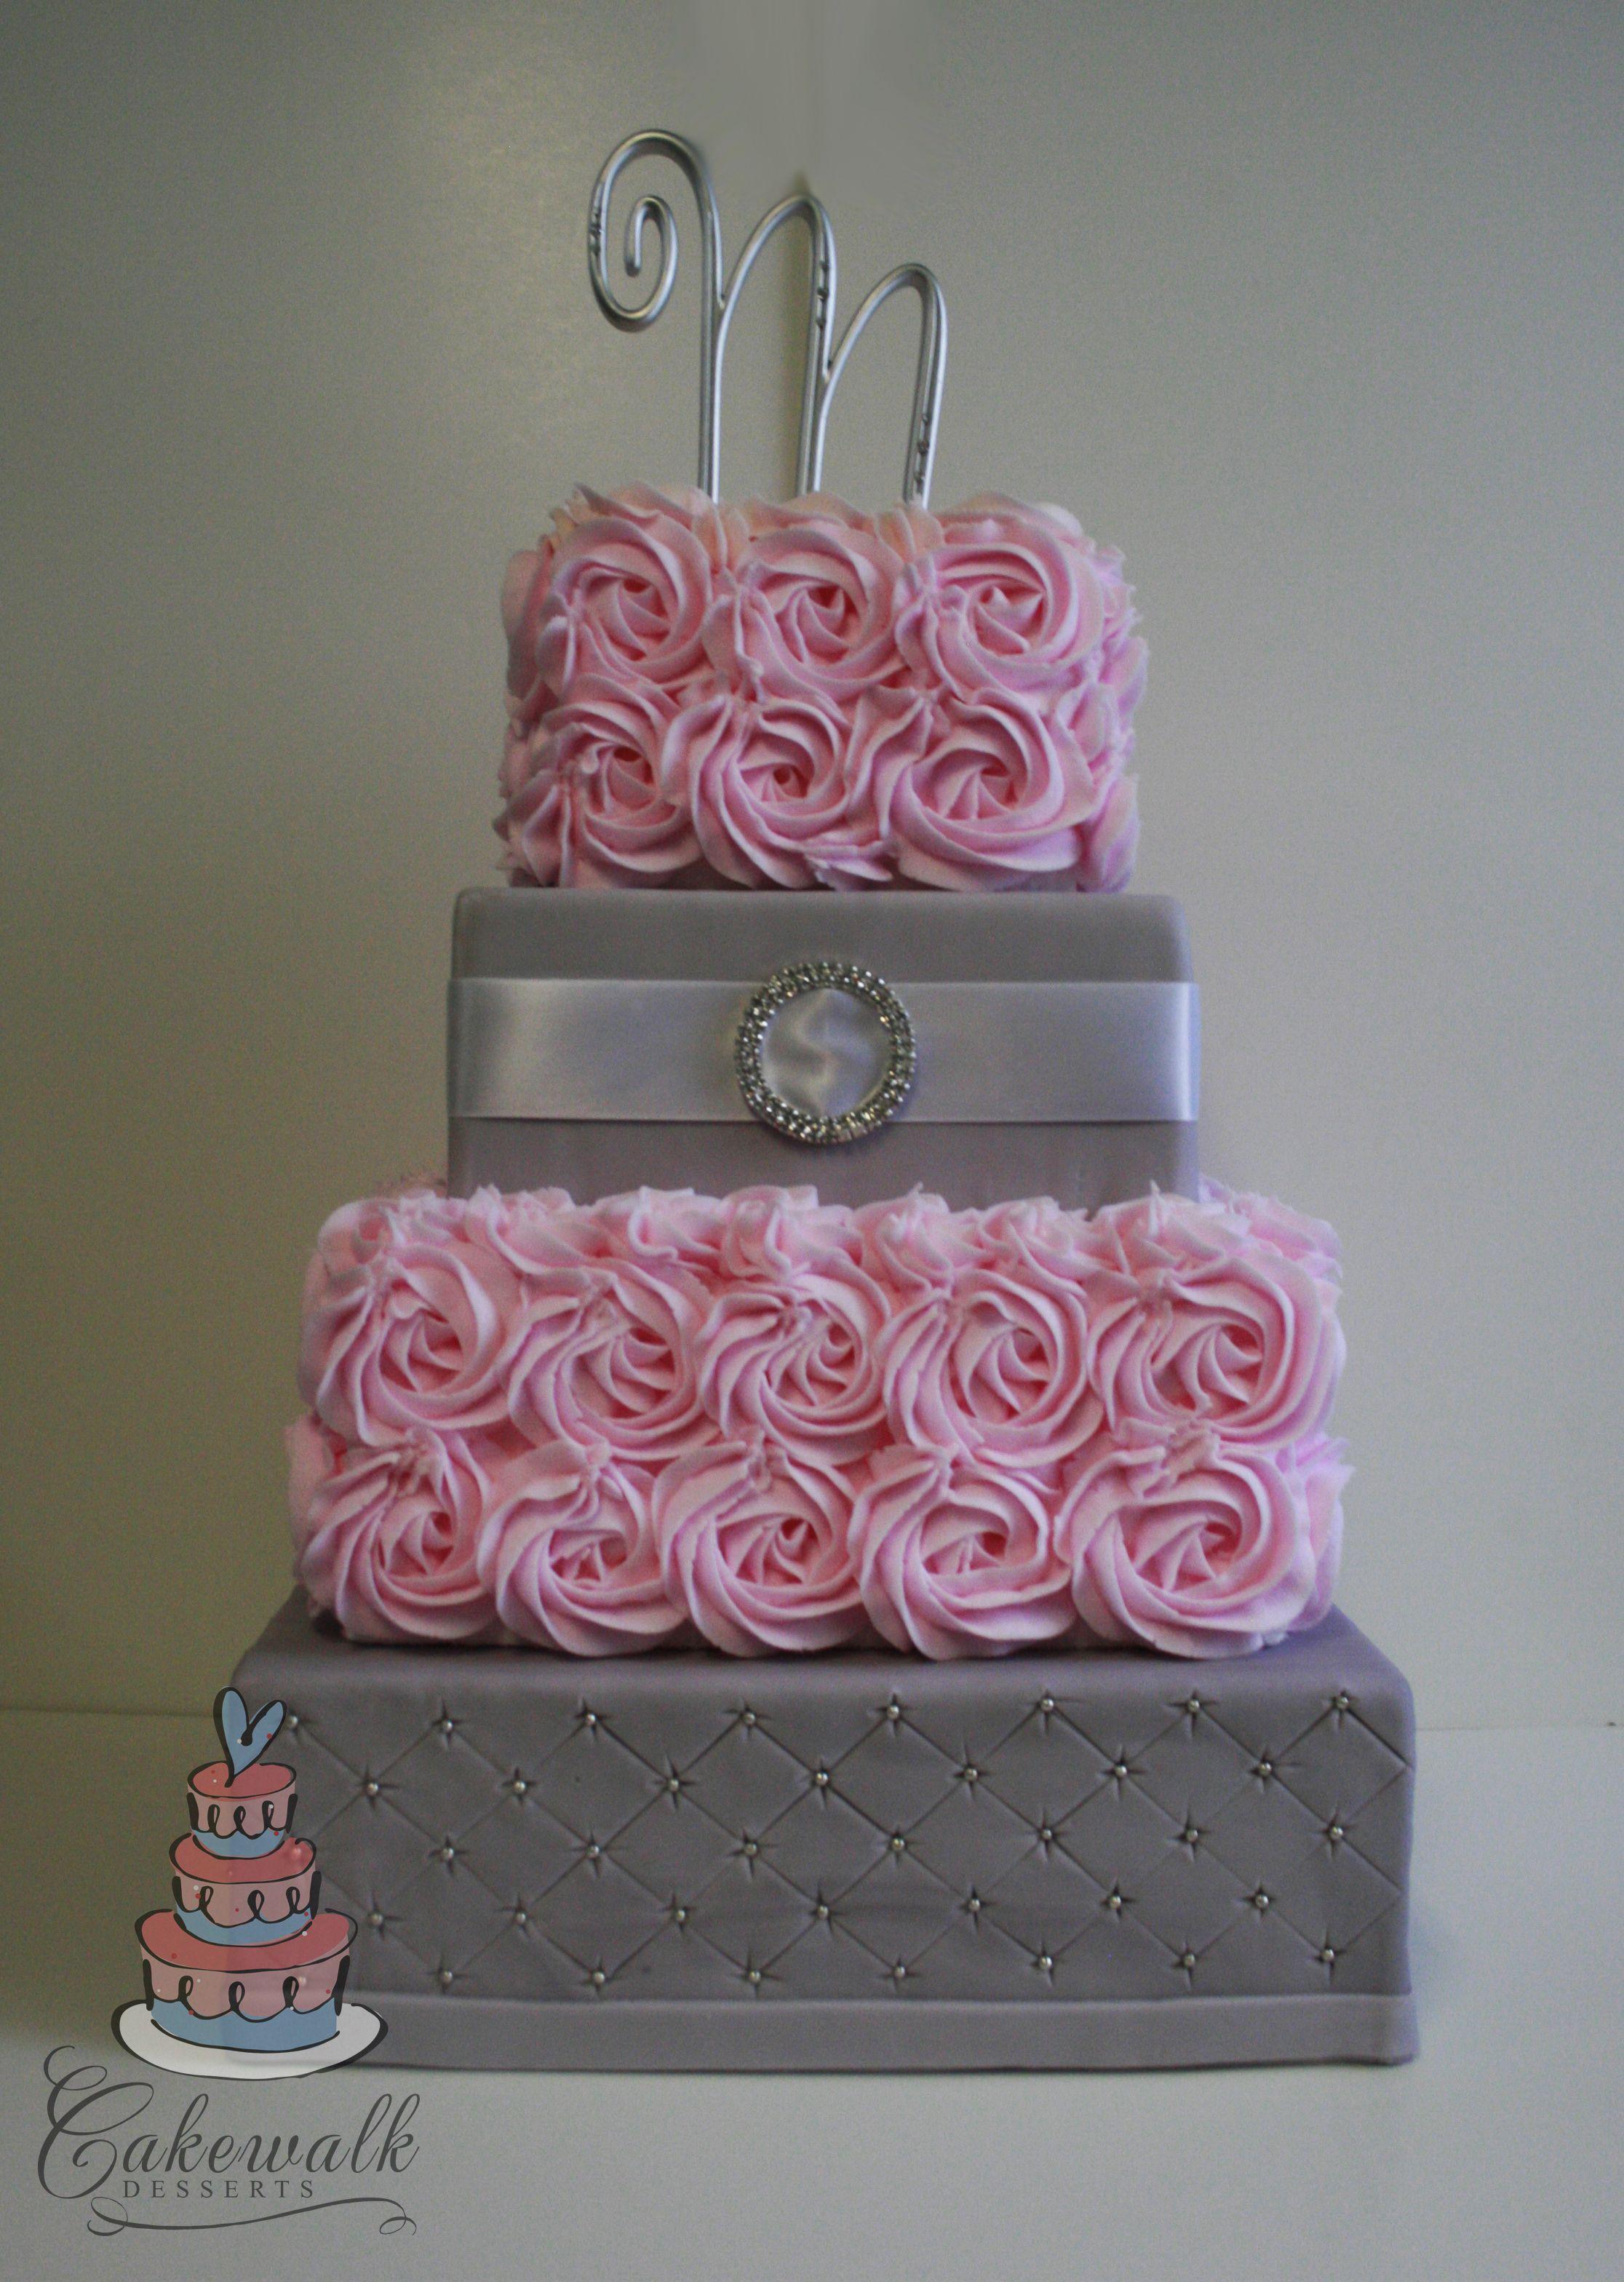 4 Tier Square Wedding Cake Pink Buttercream Roses Grey Fondant